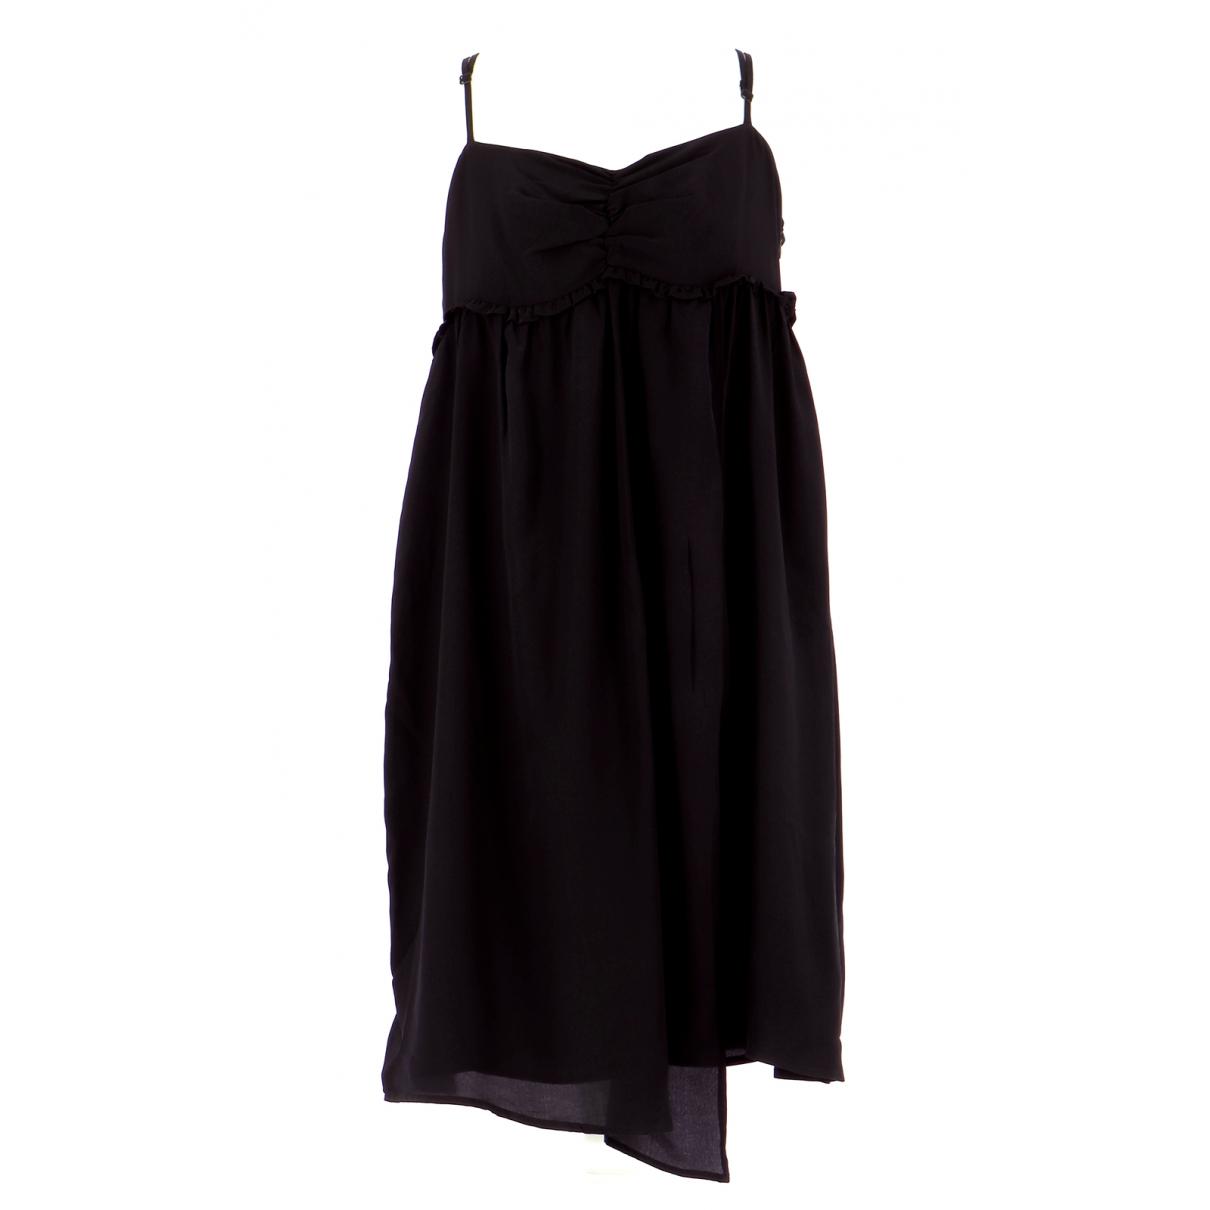 Ikks \N Kleid in  Schwarz Seide